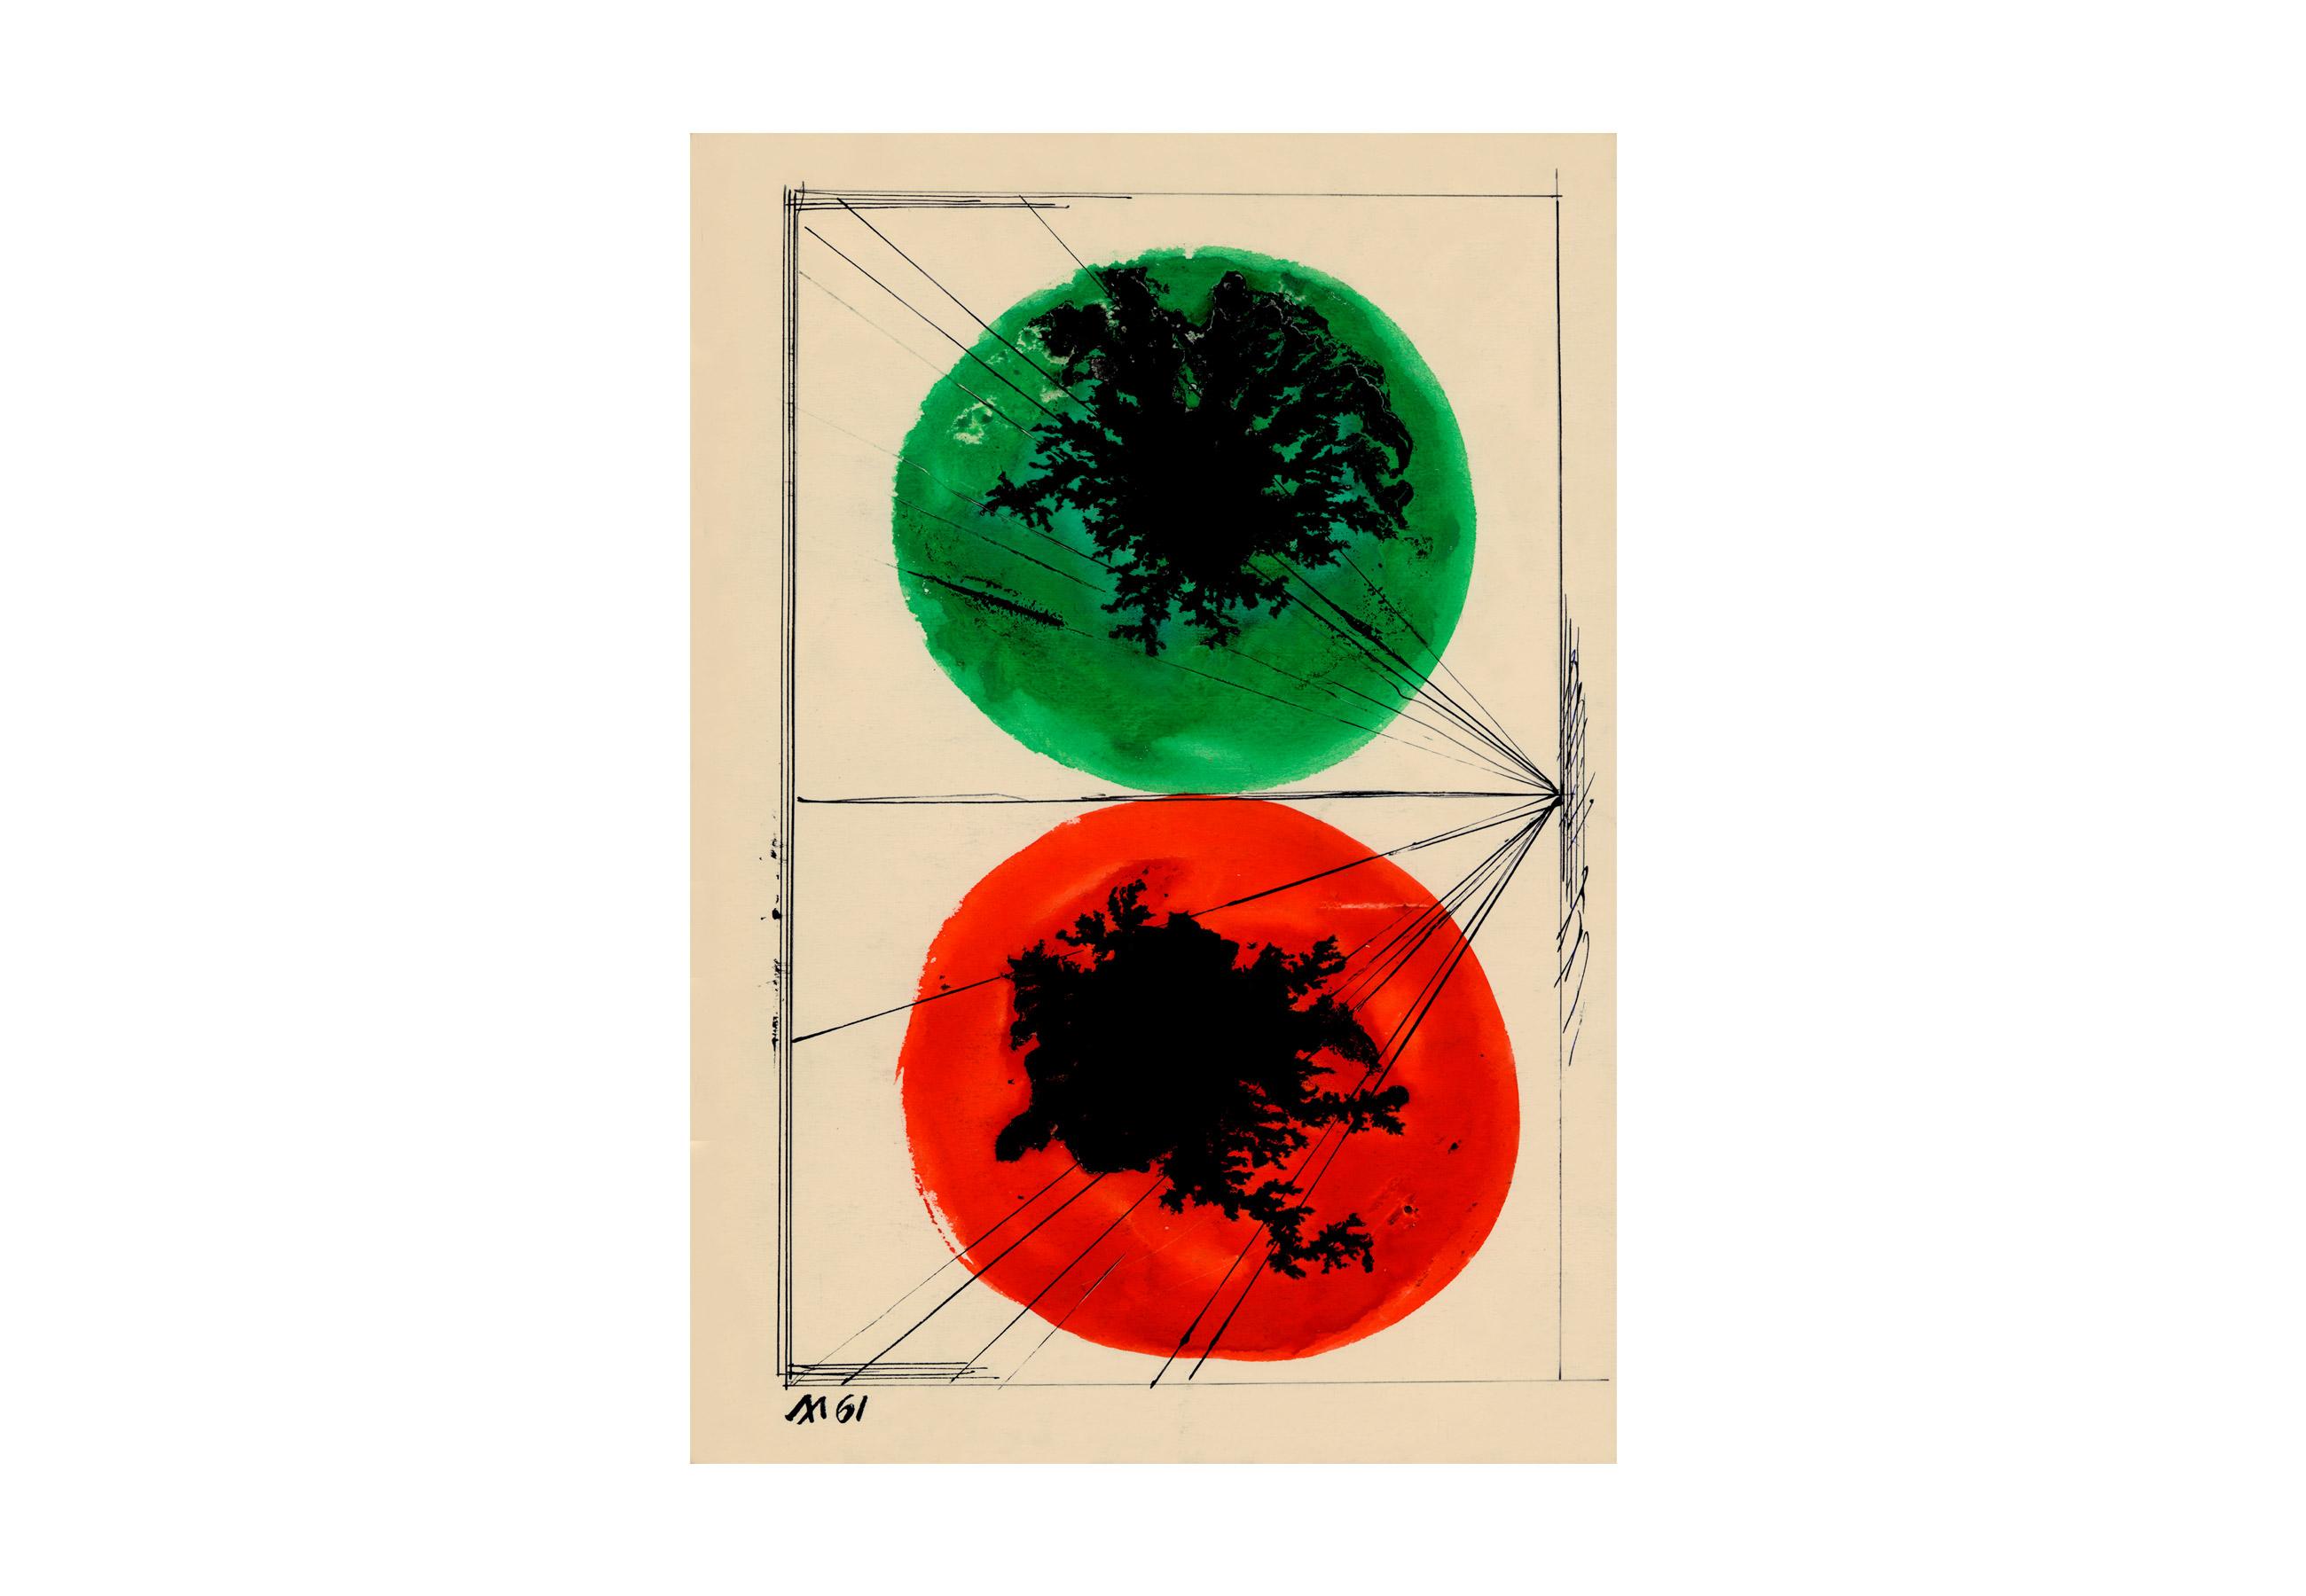 Lamm-Portfolio-1960-69-14.jpg